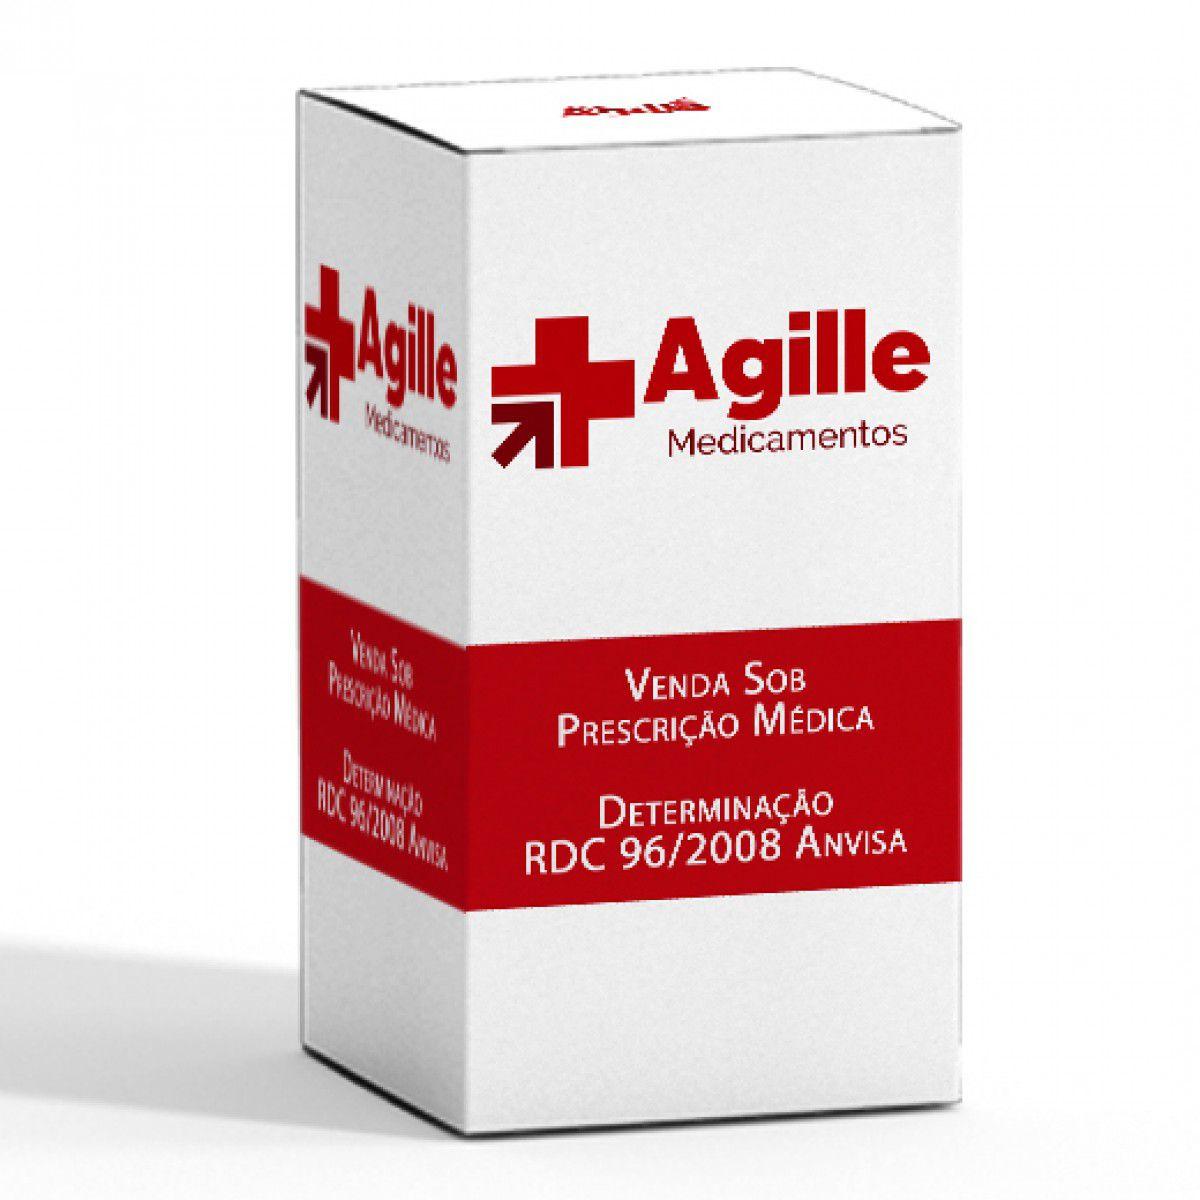 ENOXALOW 80MG SER C/10 0,8ML+ SIST. SEG.  - Agille Speciality